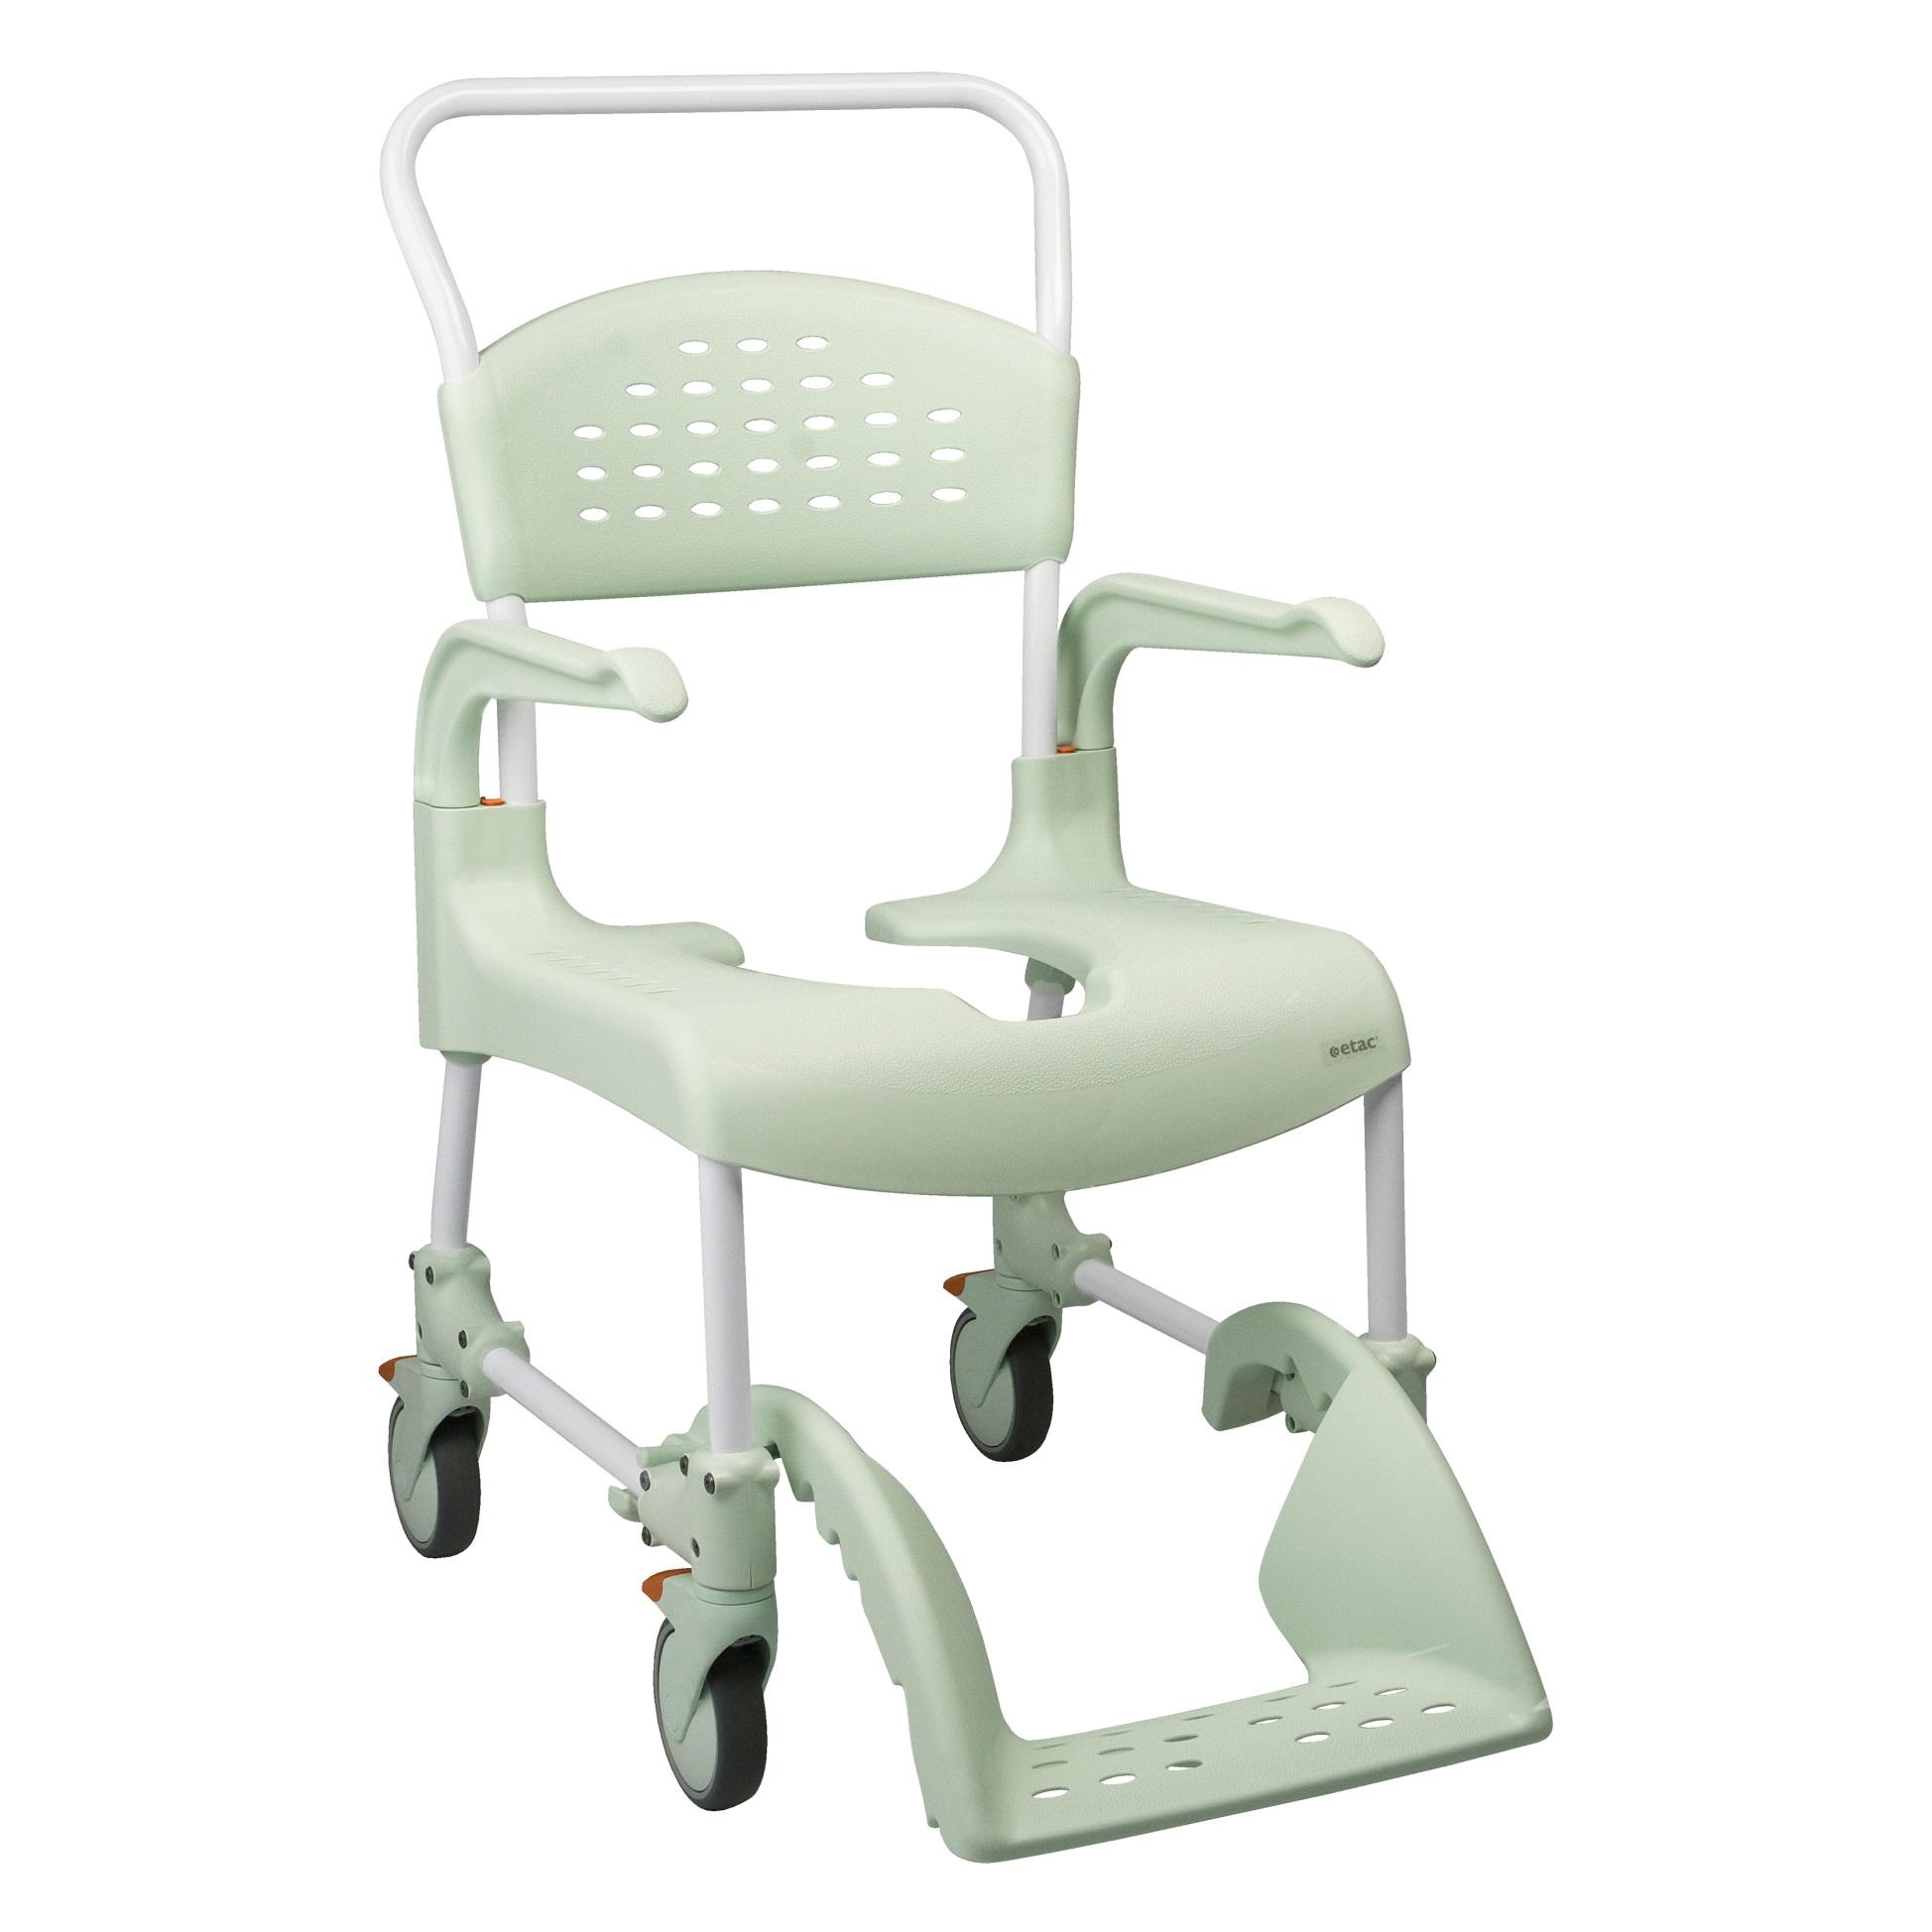 Sedia A Rotelle Da Doccia E Wc Etac Clean Ortopedia24